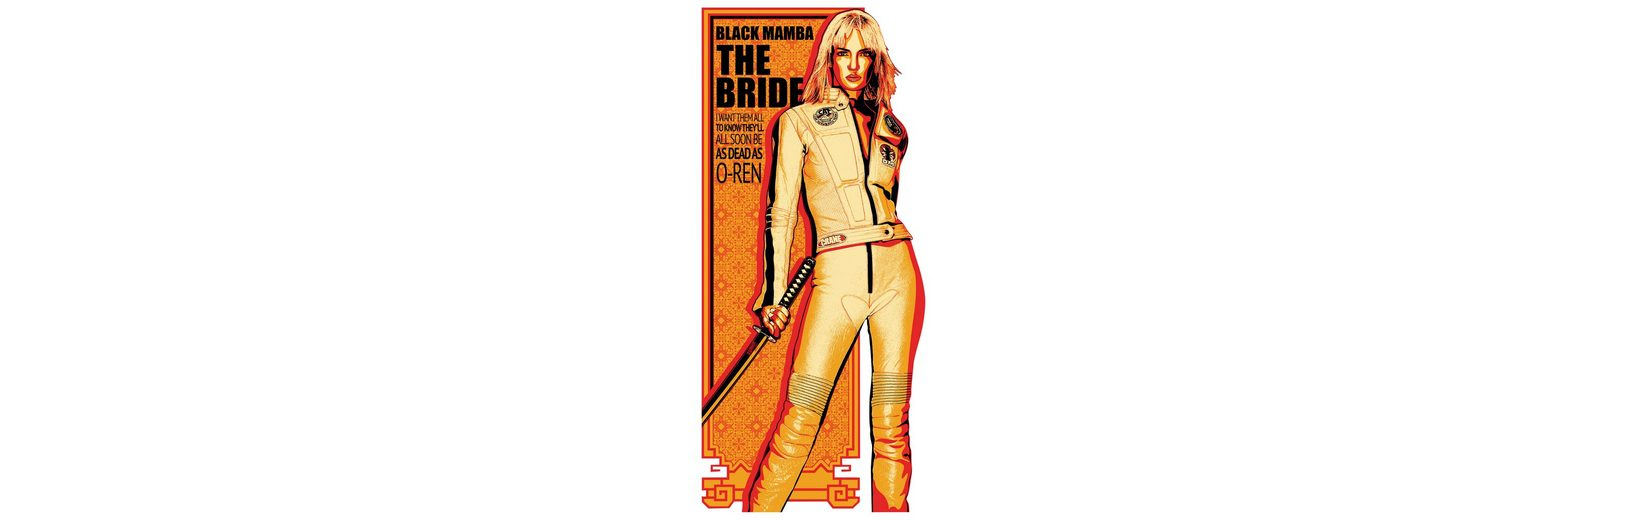 Home affaire Wandtattoo »Kill Bill - Die Braut -», 53/120 cm